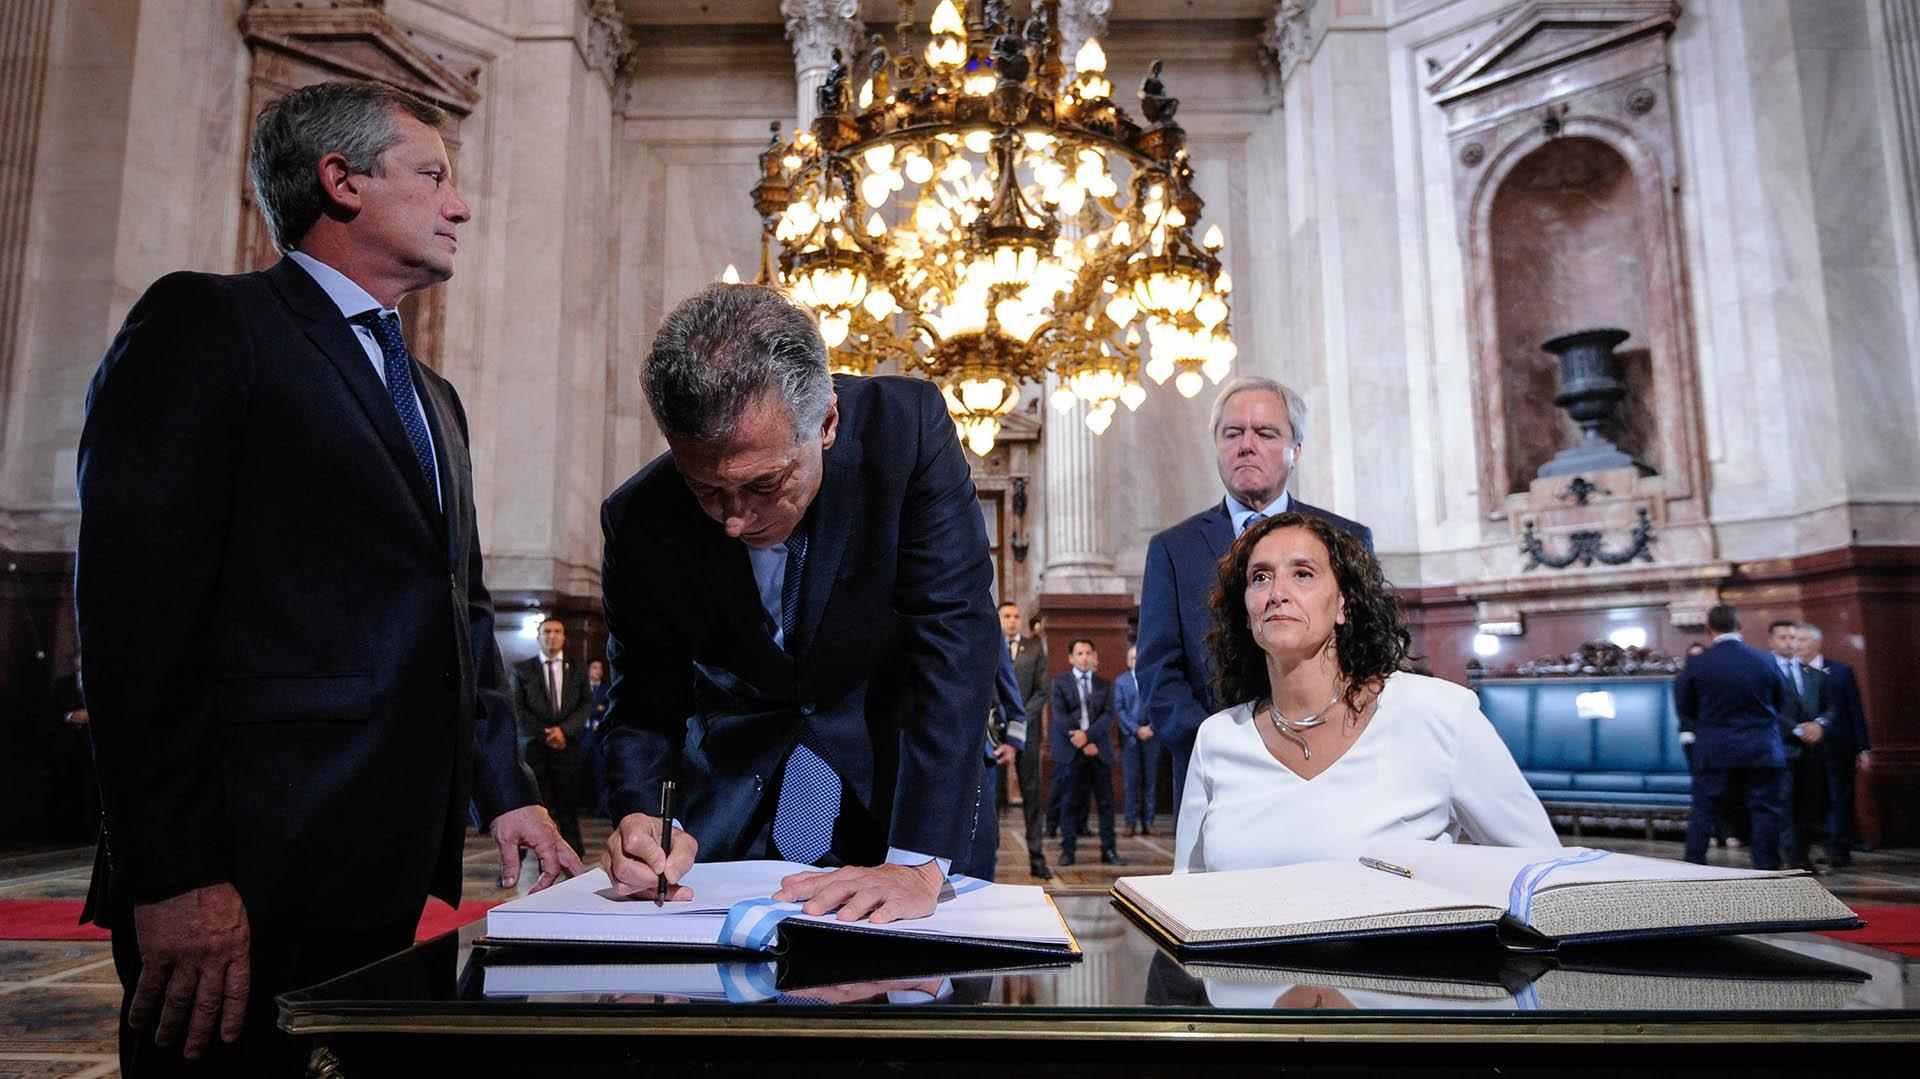 Junto a Michetti, Monzó y Pinedo. Macri firma las actas de la Asamblea Legislativa 2018